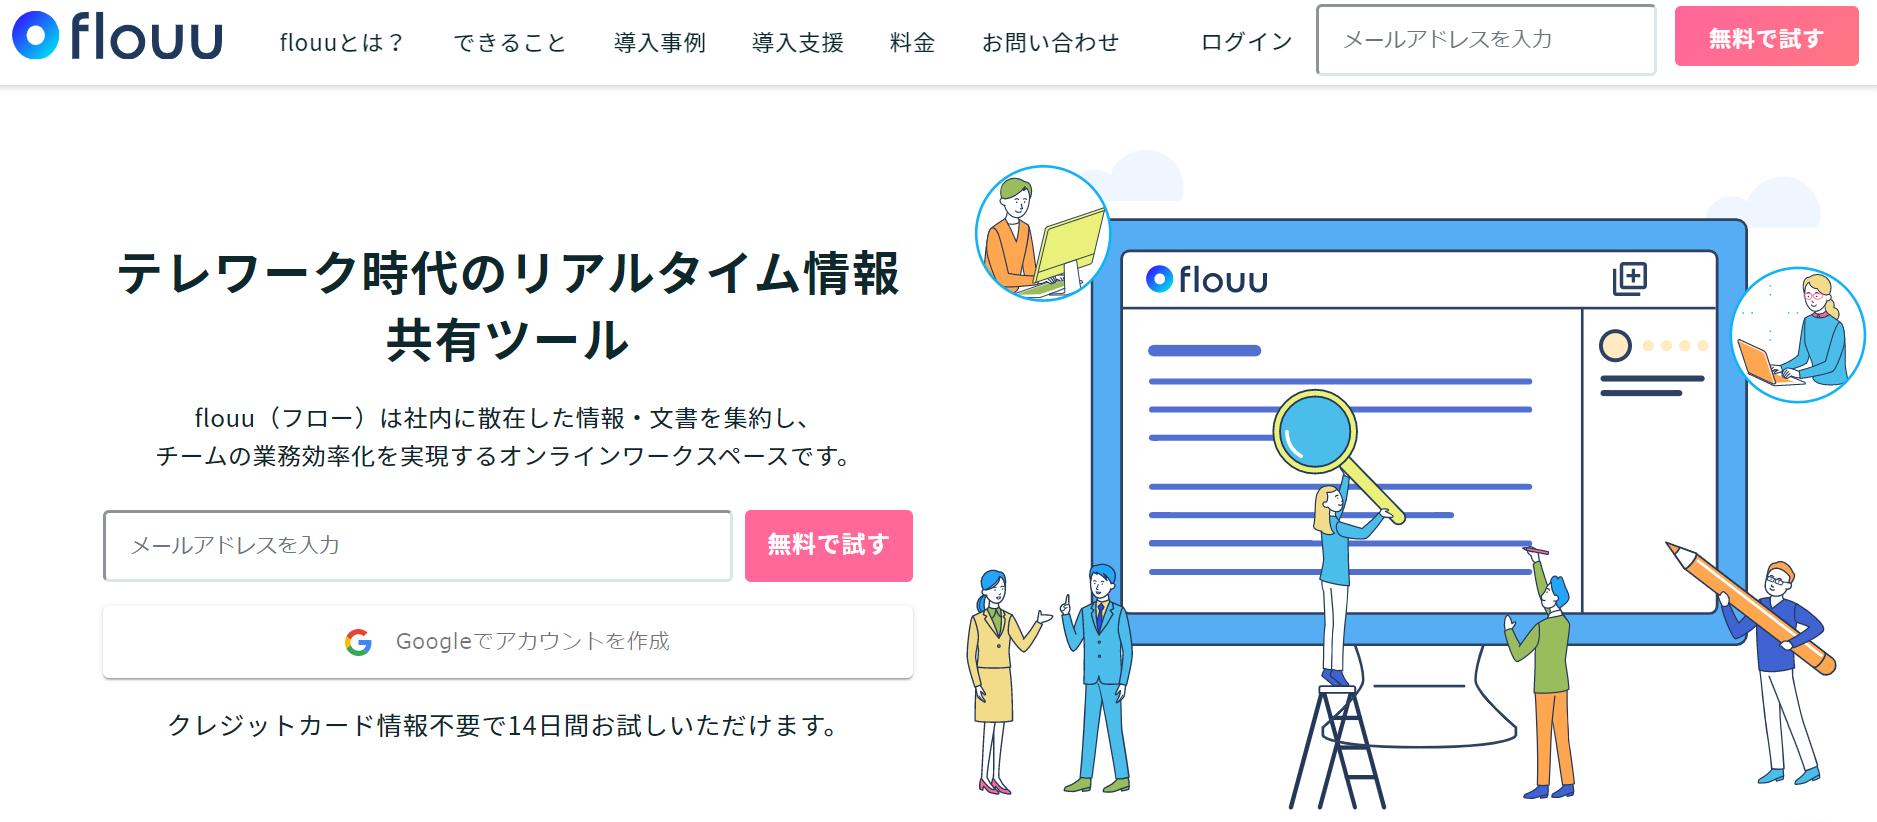 flouu 公式Webサイト